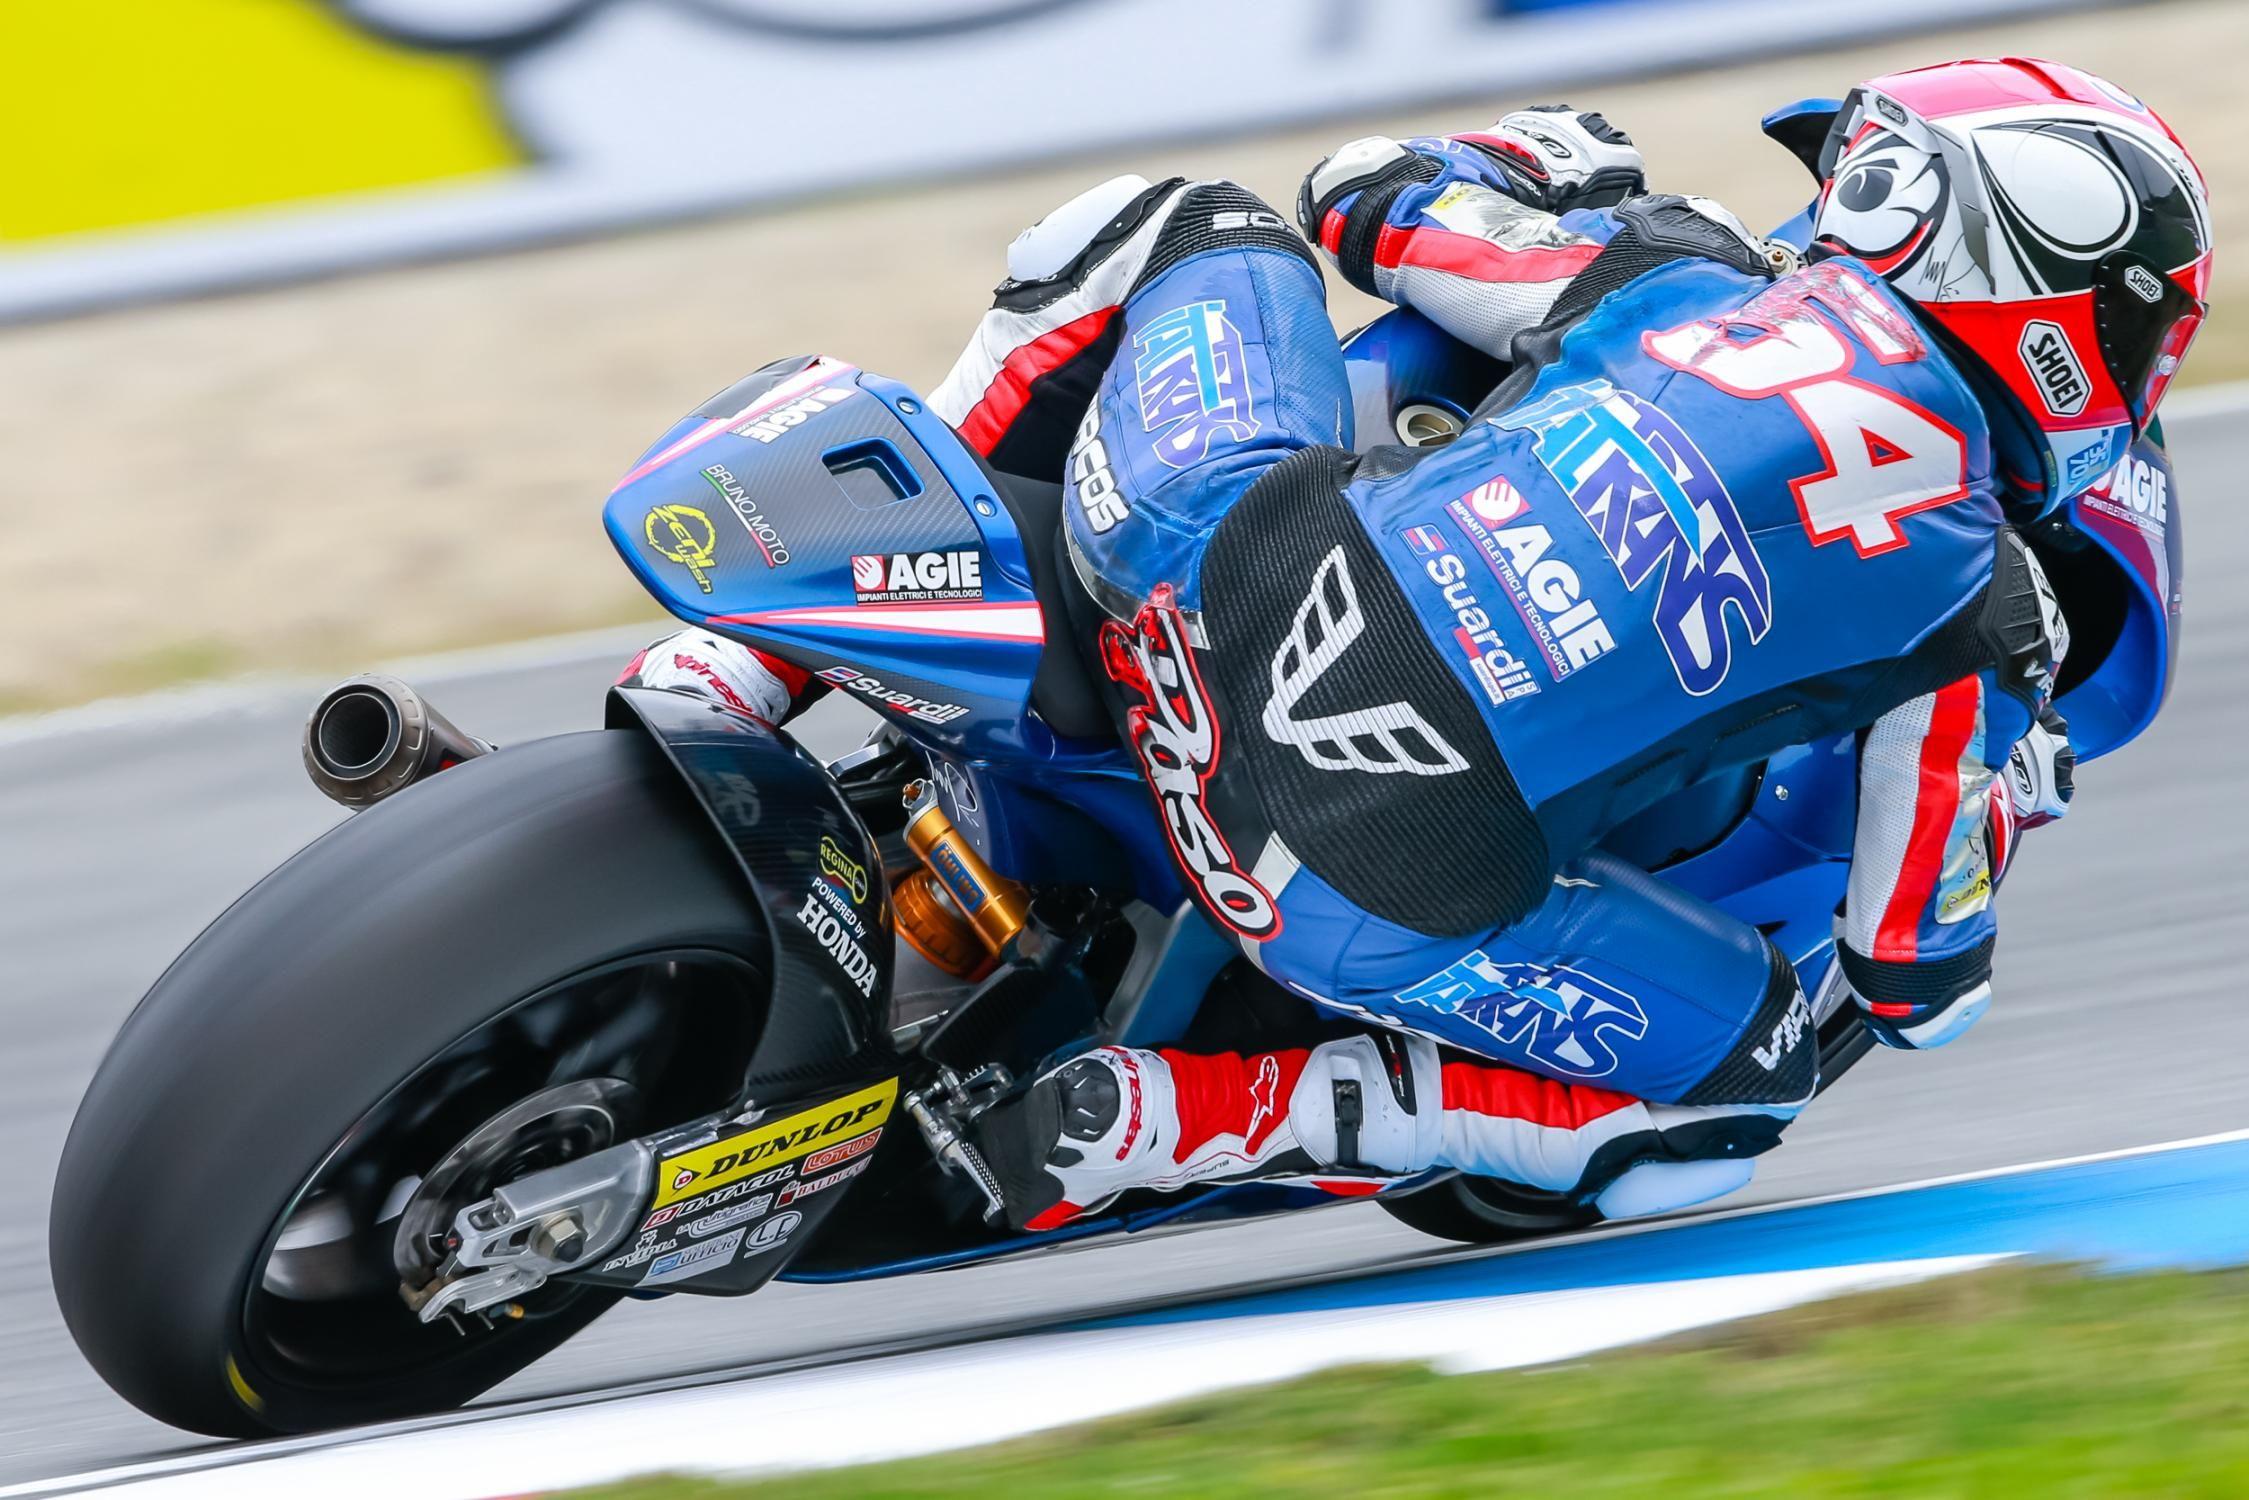 54 mattia pasini italtrans racing team moto2 brno 2016 motogp moto2 moto3 pinterest racing team and motogp